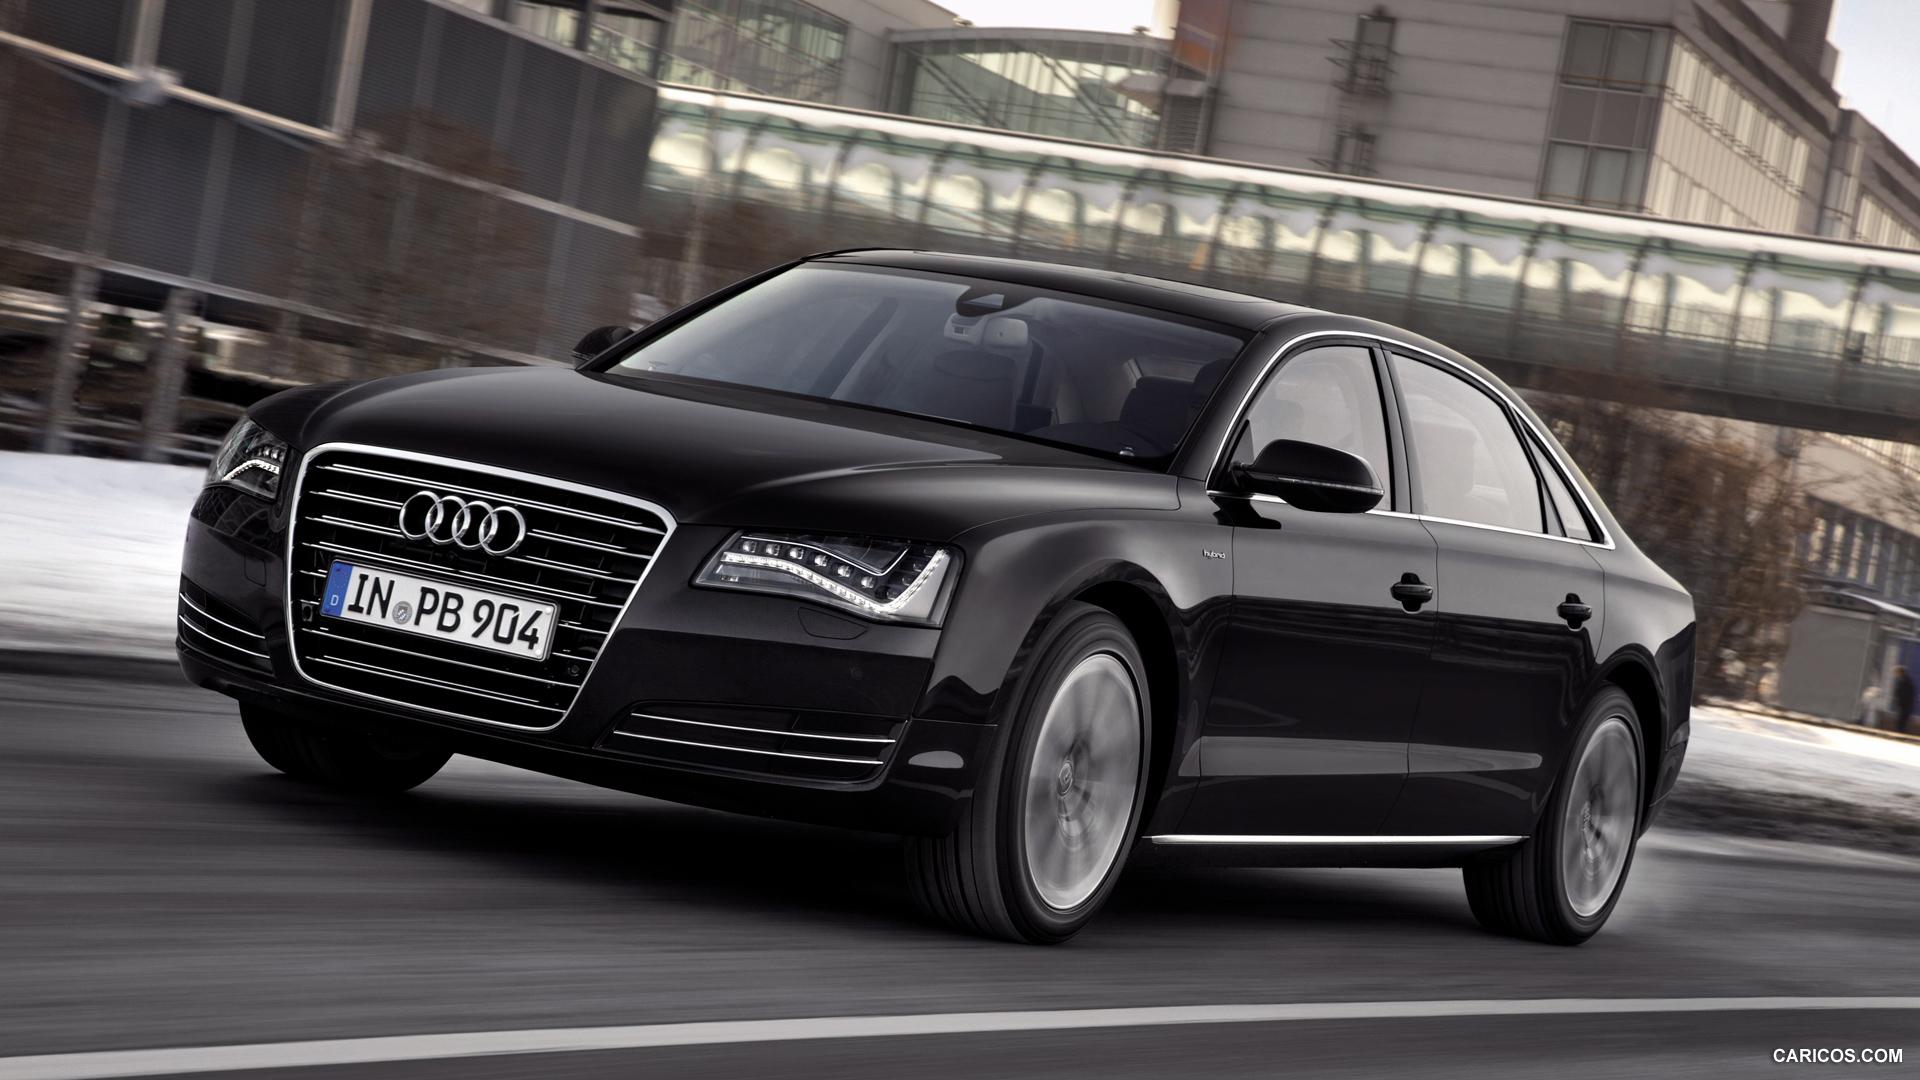 2013 Audi A8 Image 12